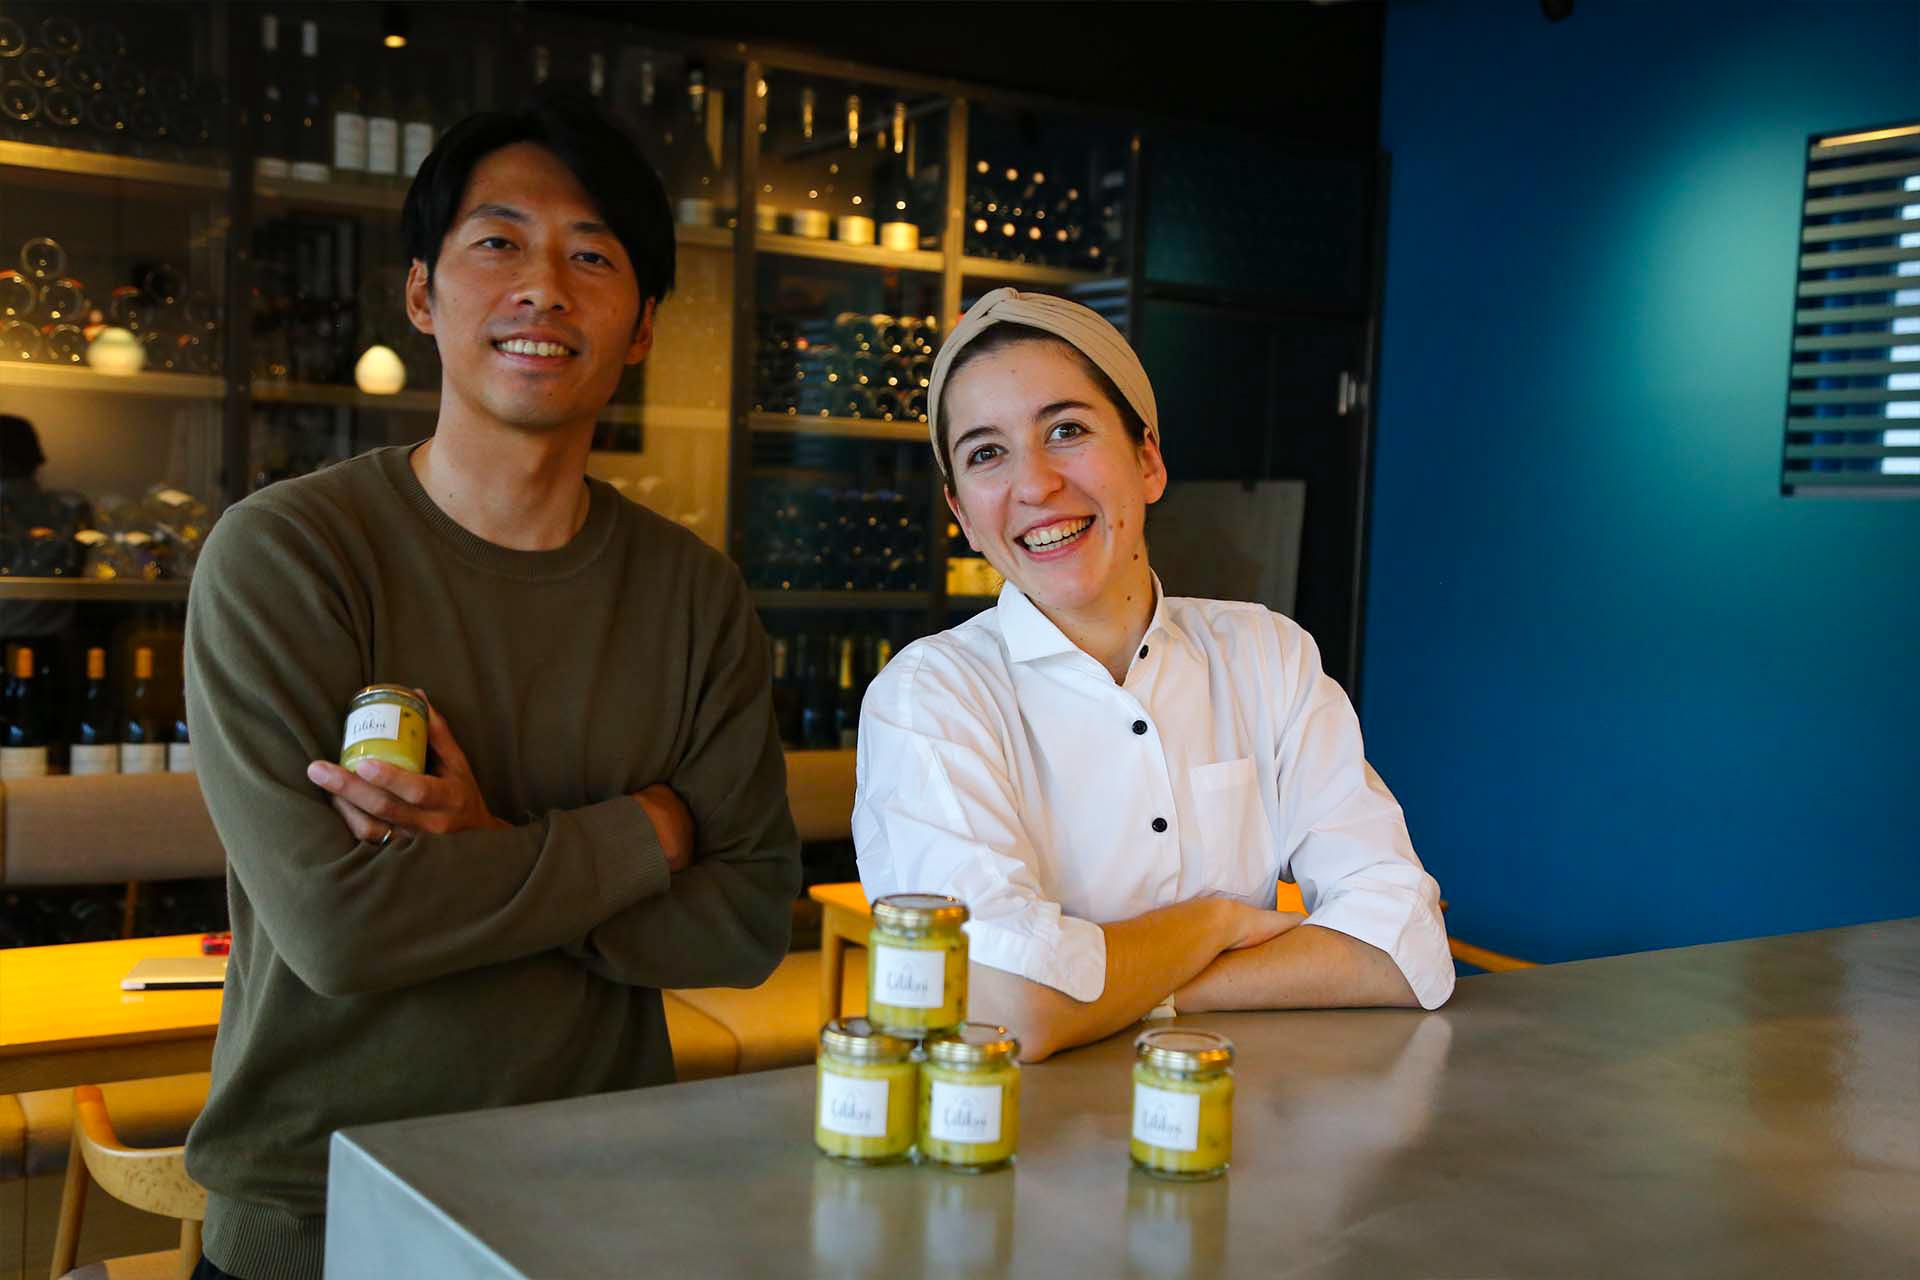 RYO'S FARM - Lilikoi Butter now available !- アペロ ワインバー / オーガニックワインxフランス家庭料理 - 東京都港区南青山3-4-6 / apéro WINEBAR - vins et petits plats français - 2016